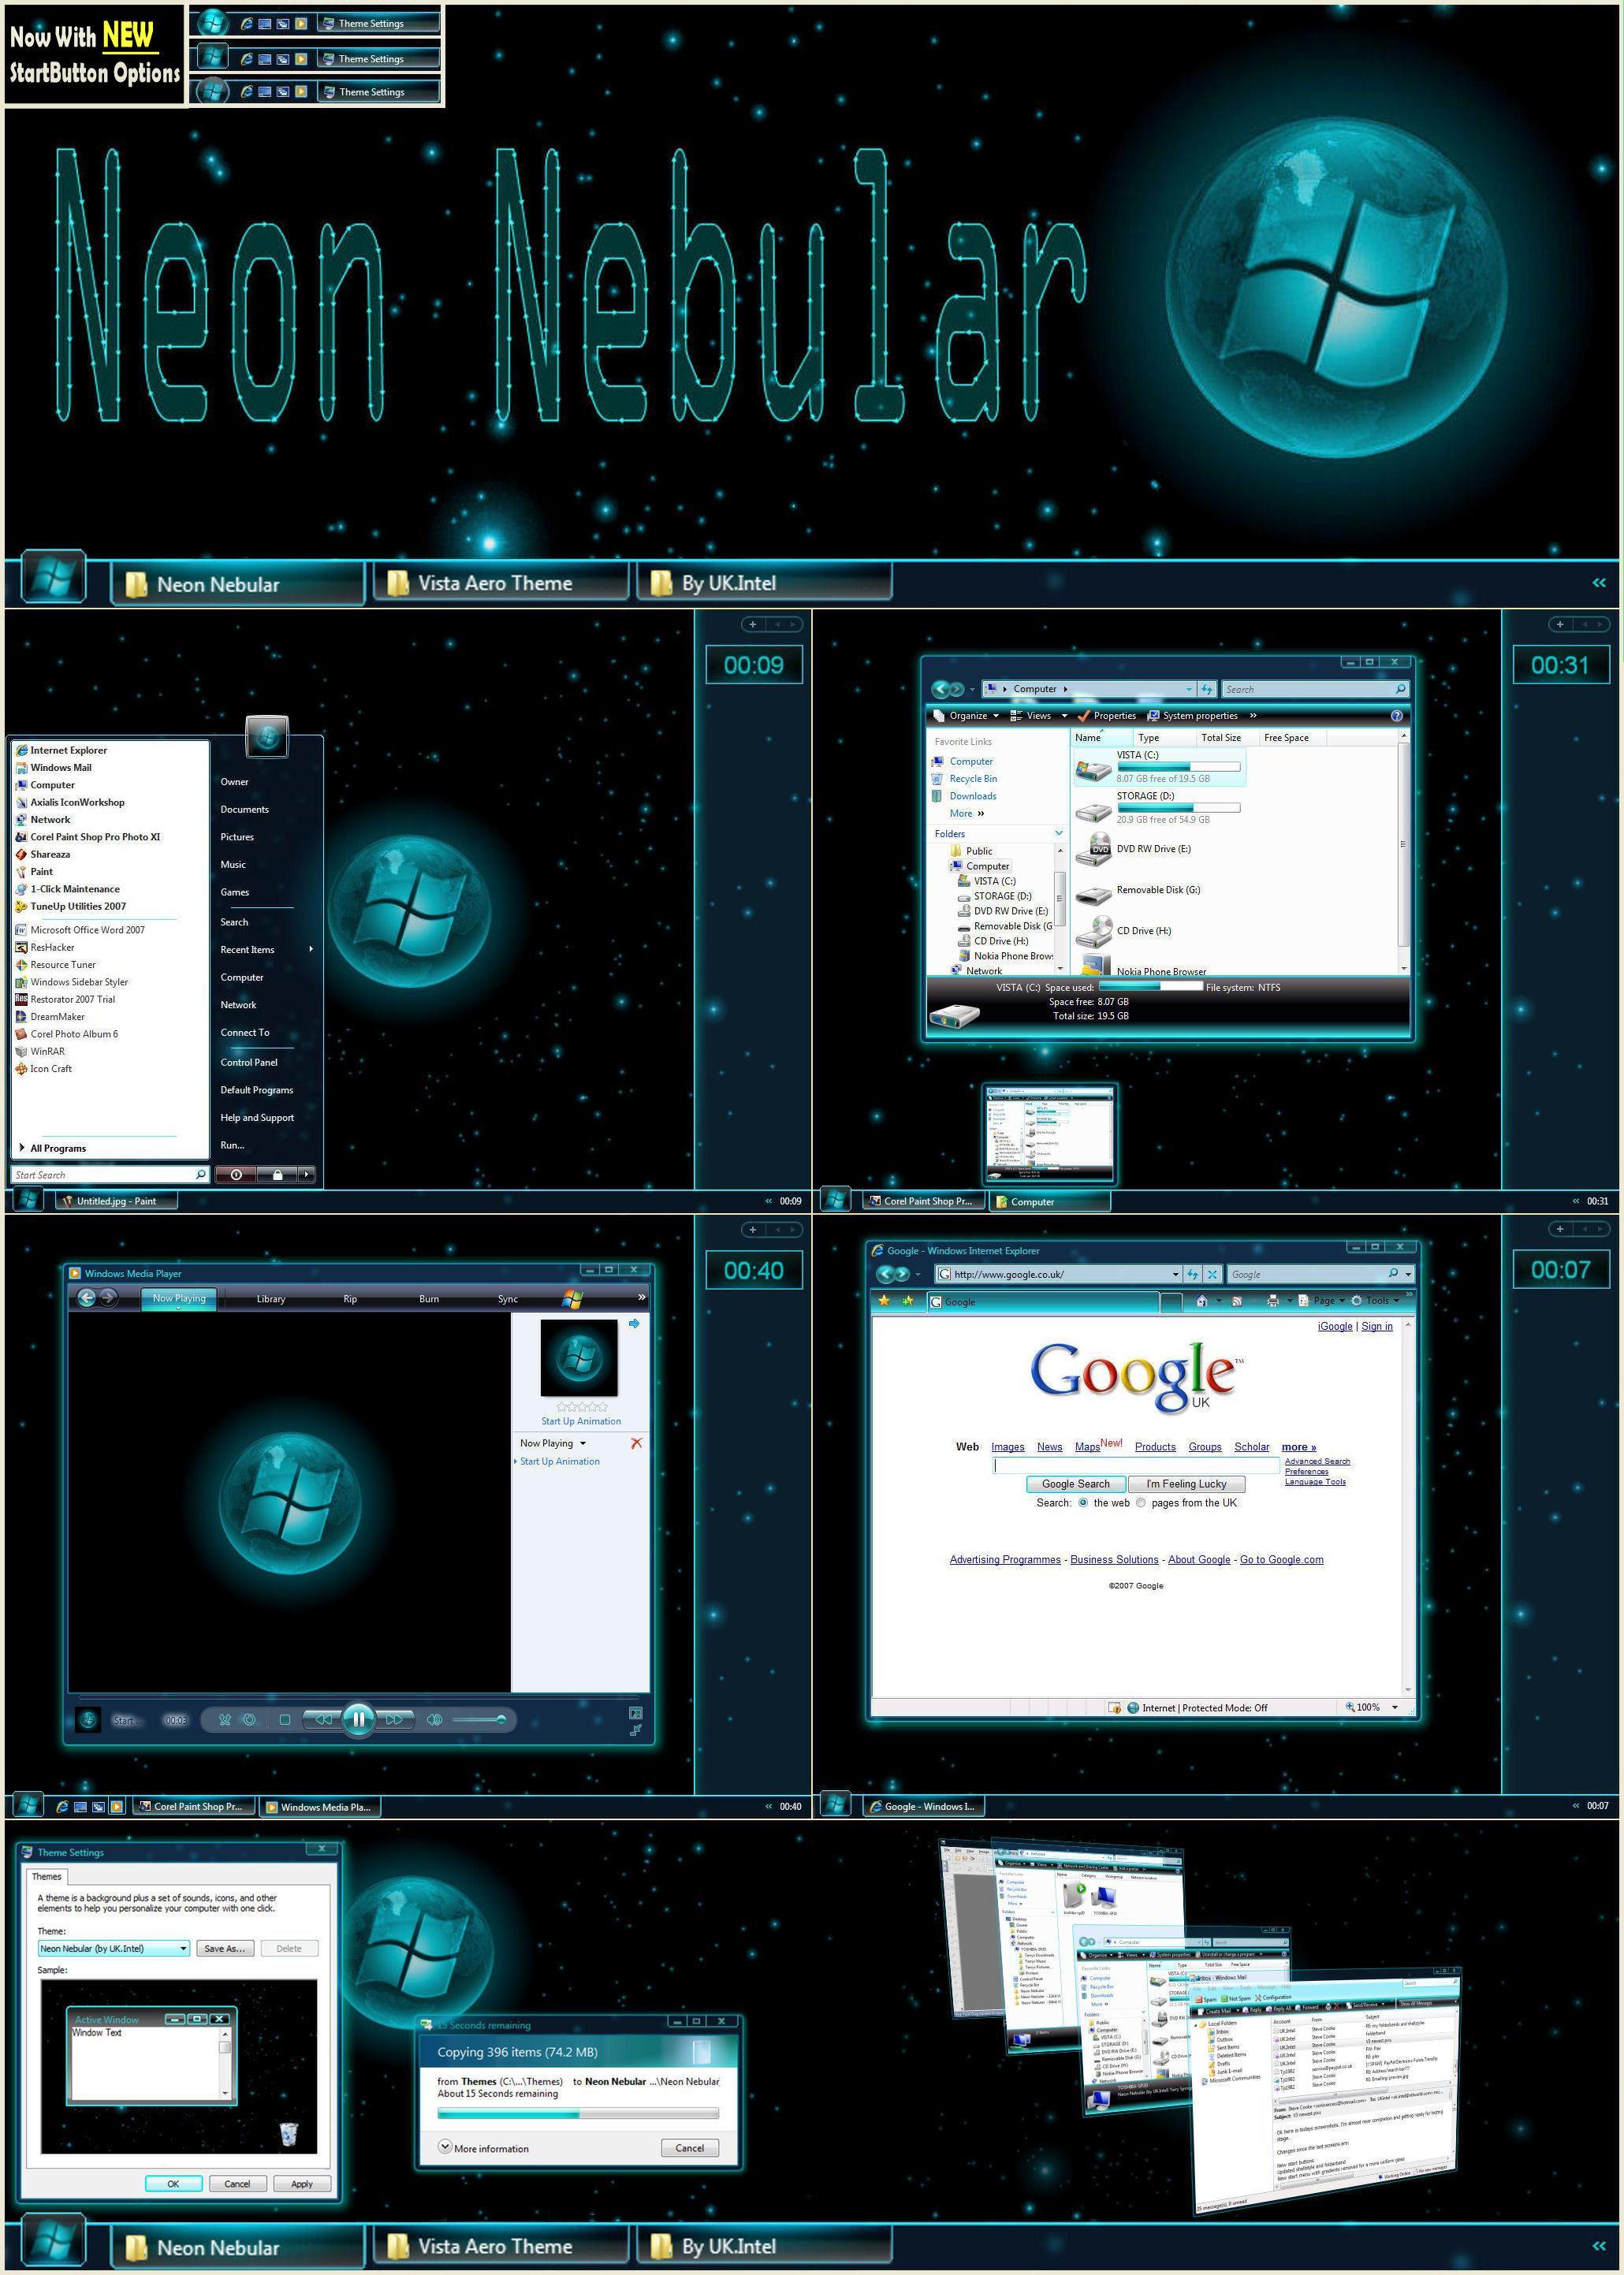 Google uk themes -  Neon Nebular 32bit Vista Theme By Ukintel